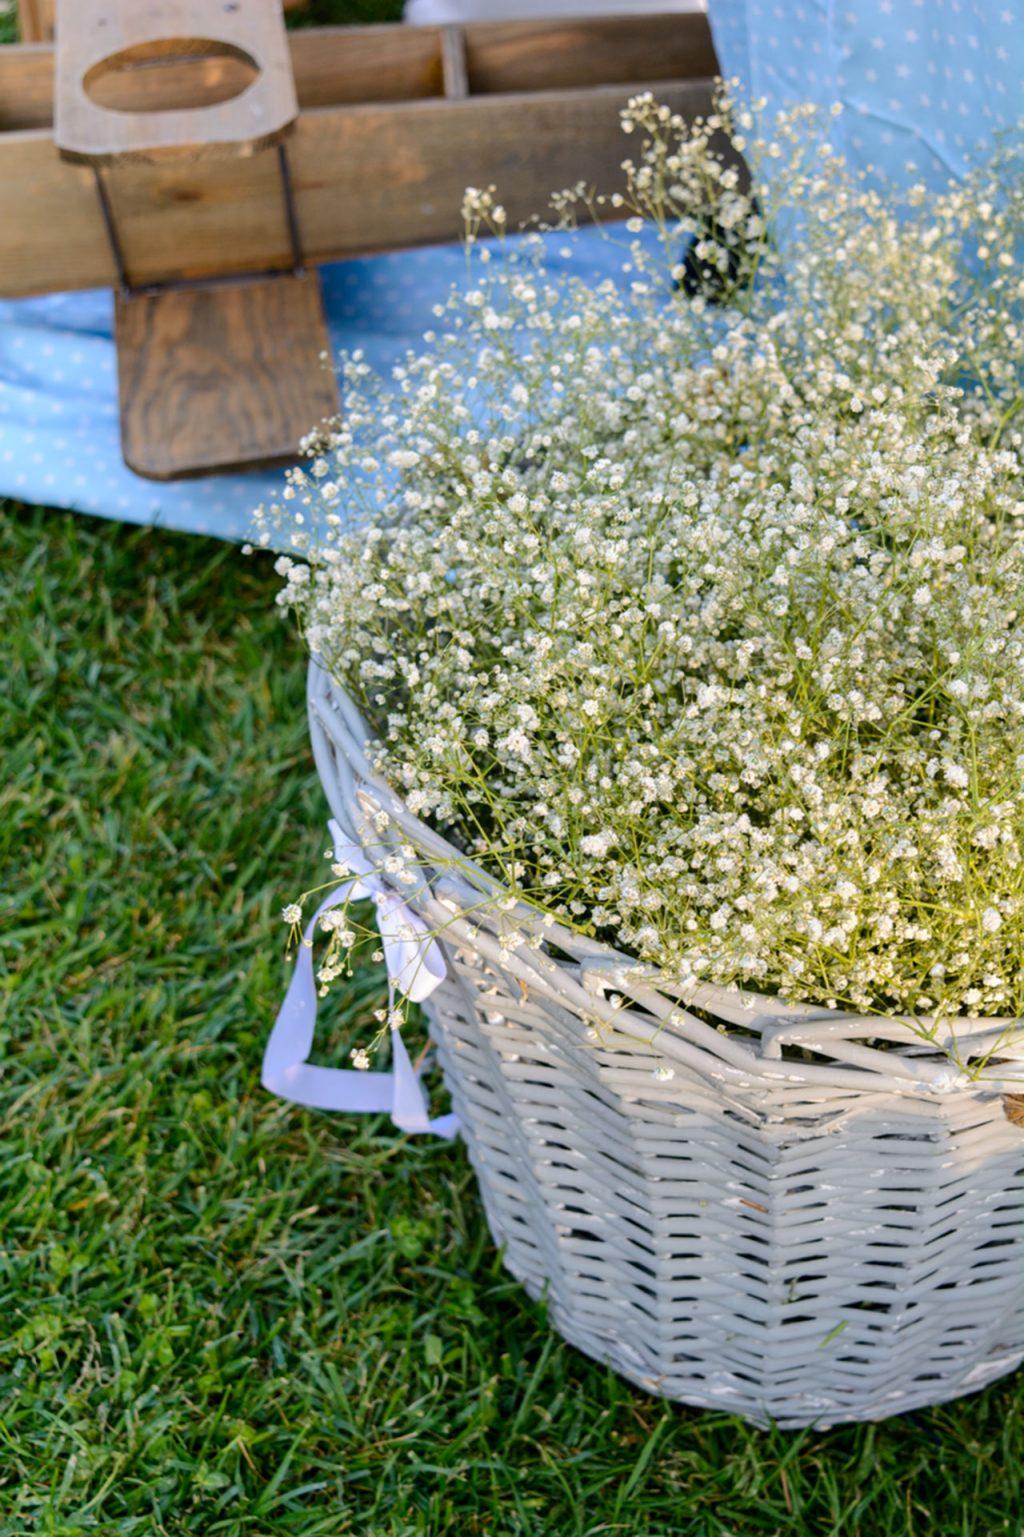 gamos-vaptisi-ktima-ariadni-fly-with-me-stolismos-basket-flowers